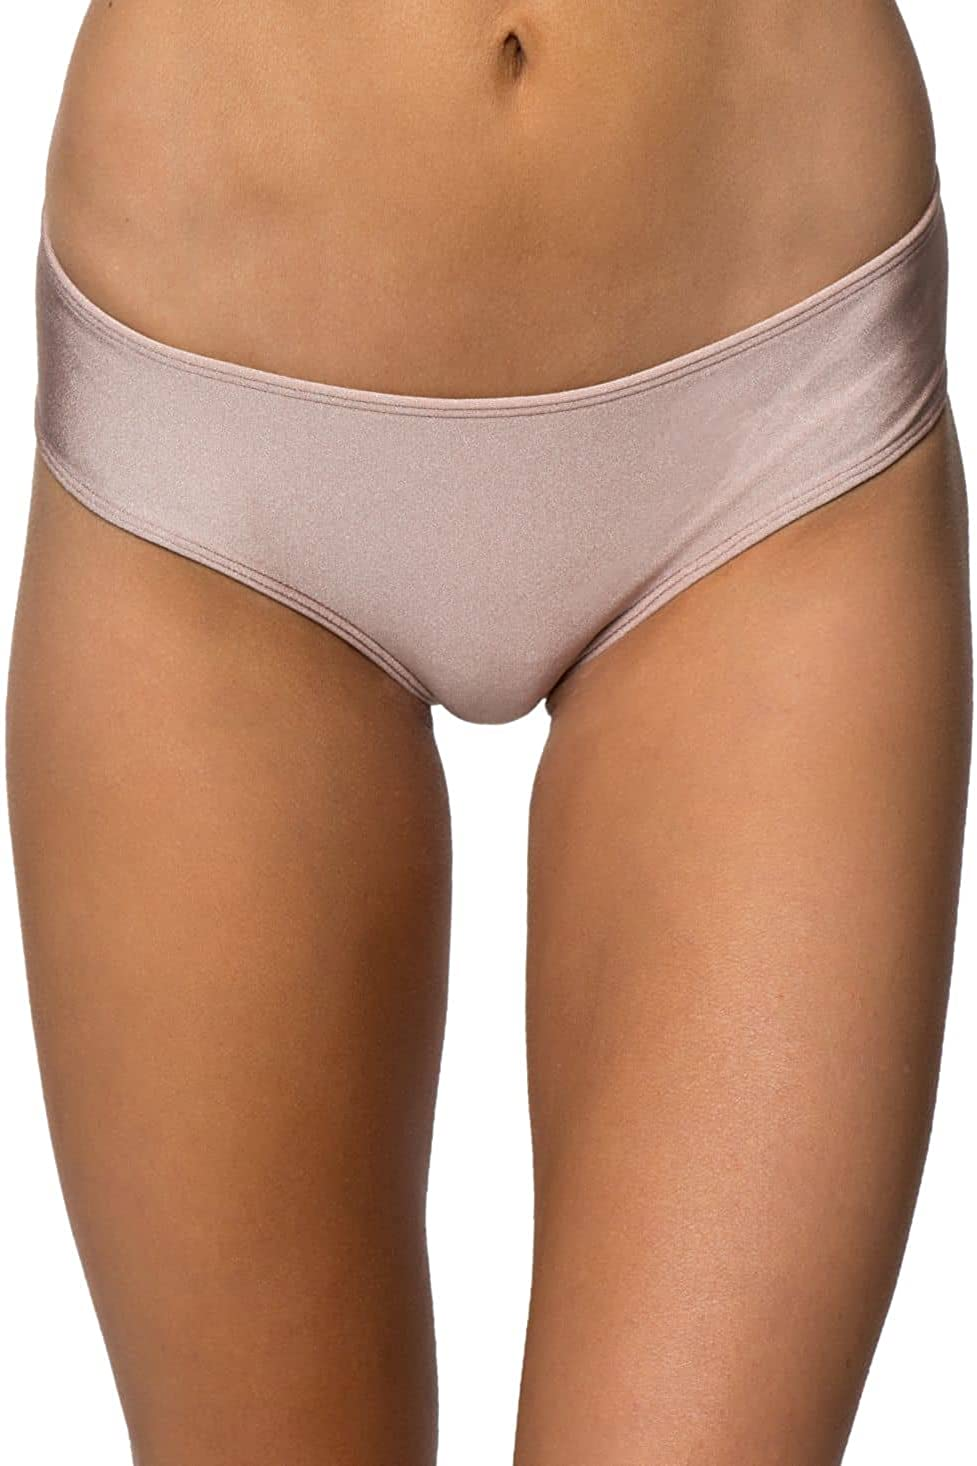 O'NEILL Cozmo Shiny Cheeky Hipster Bikini Bottoms Rose Pink Large